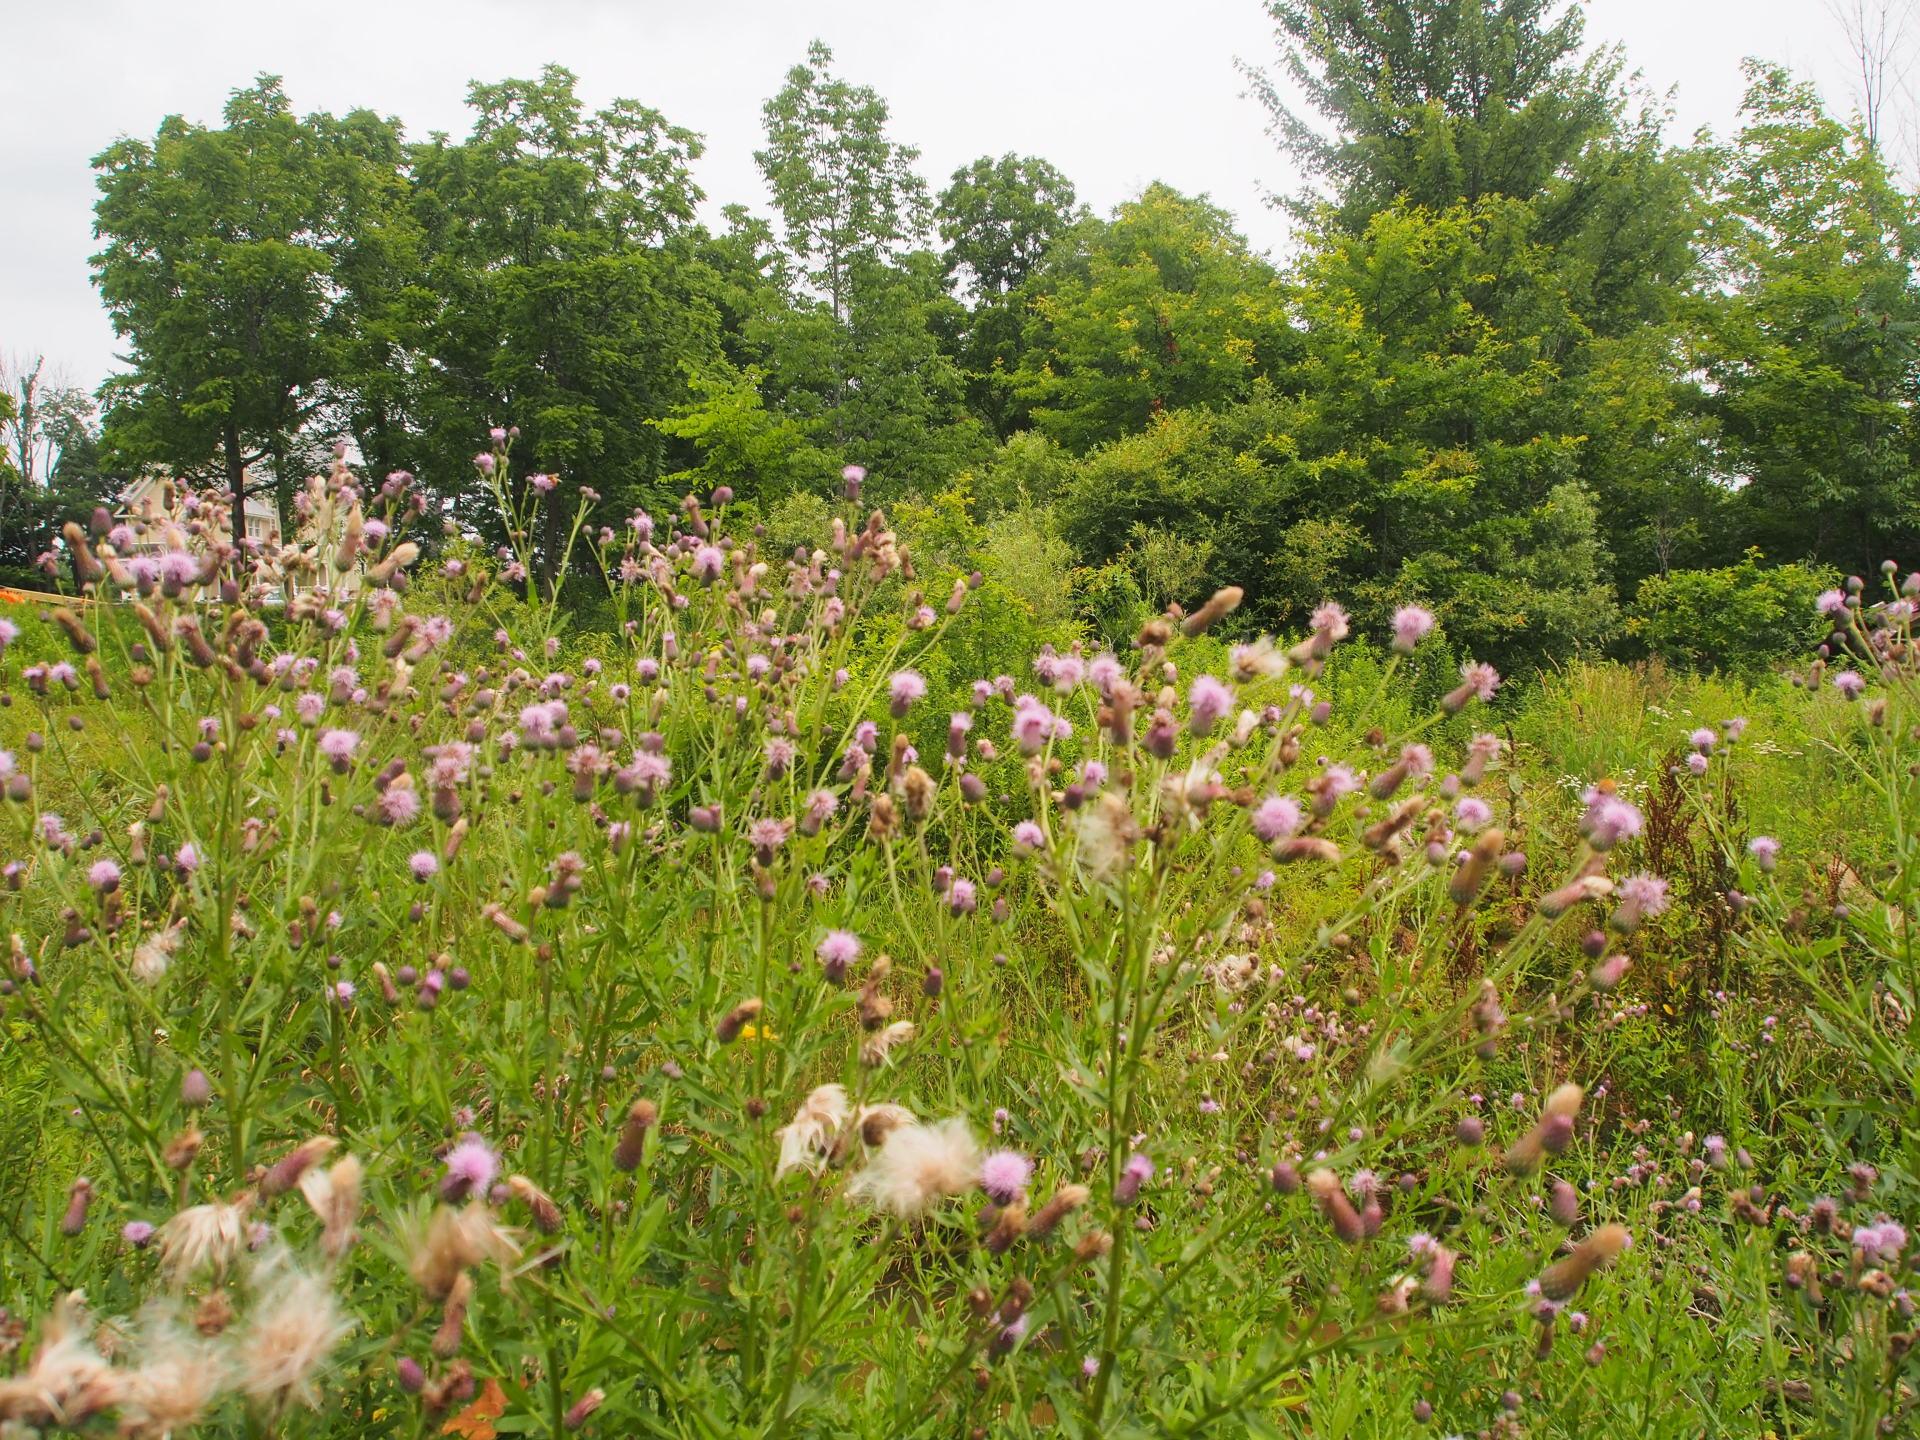 Wildflowers flowering in the fields